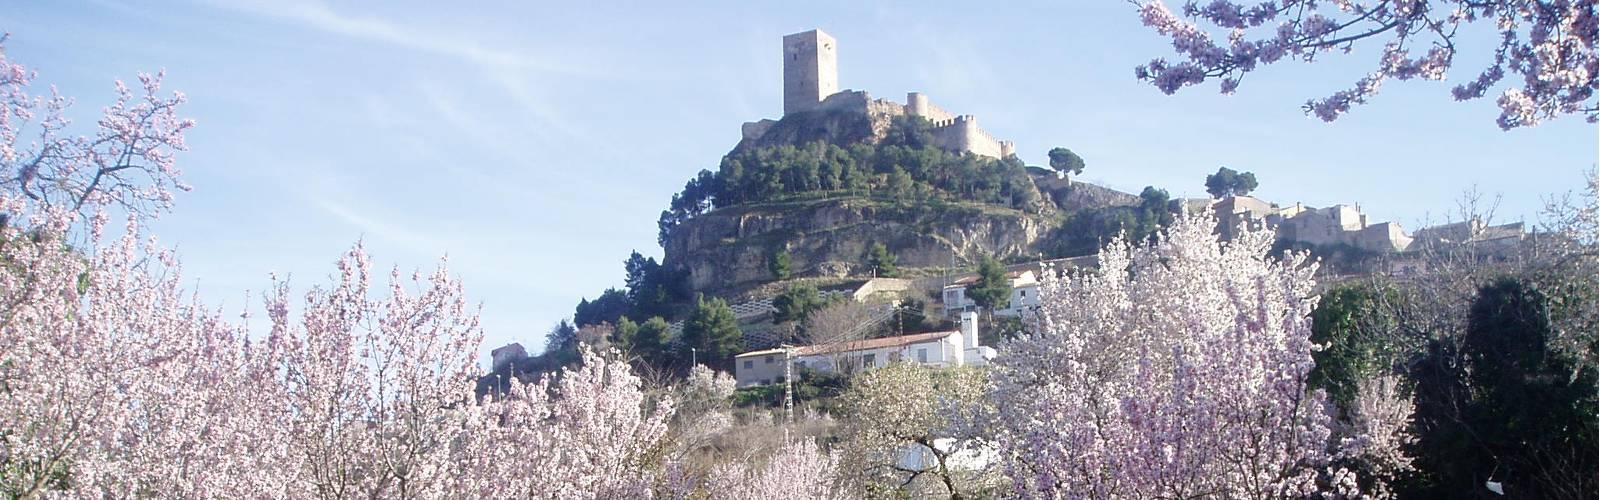 Turismo Biar. Cultura, naturaleza y aventura en Biar.